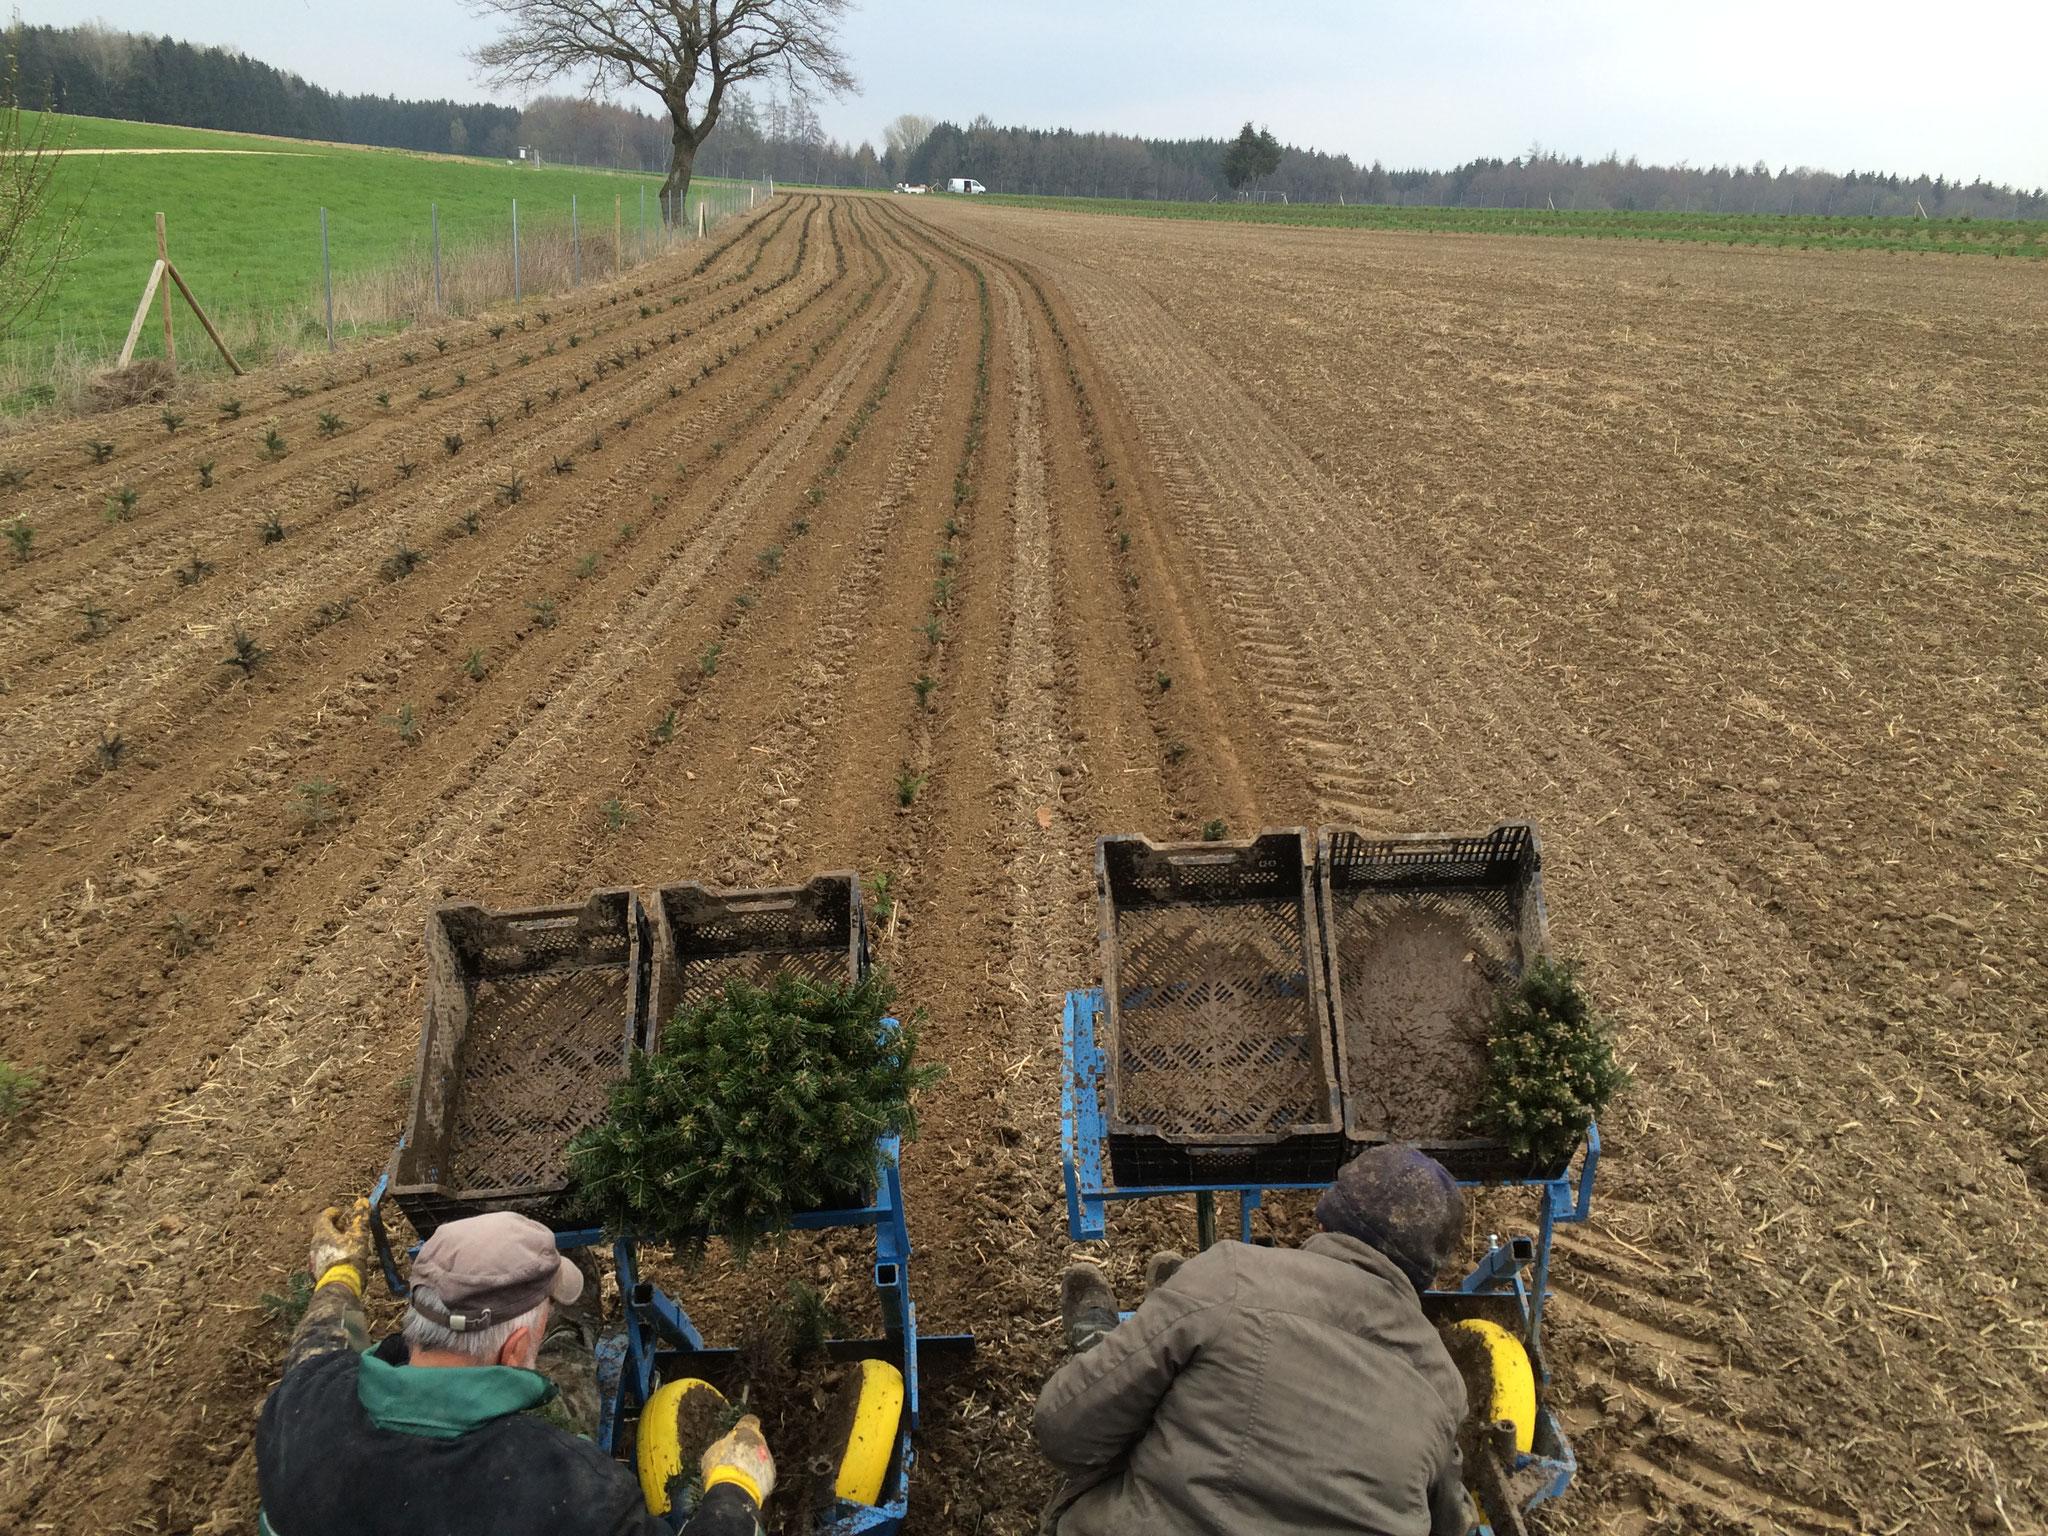 Maschinelle Pflanzung